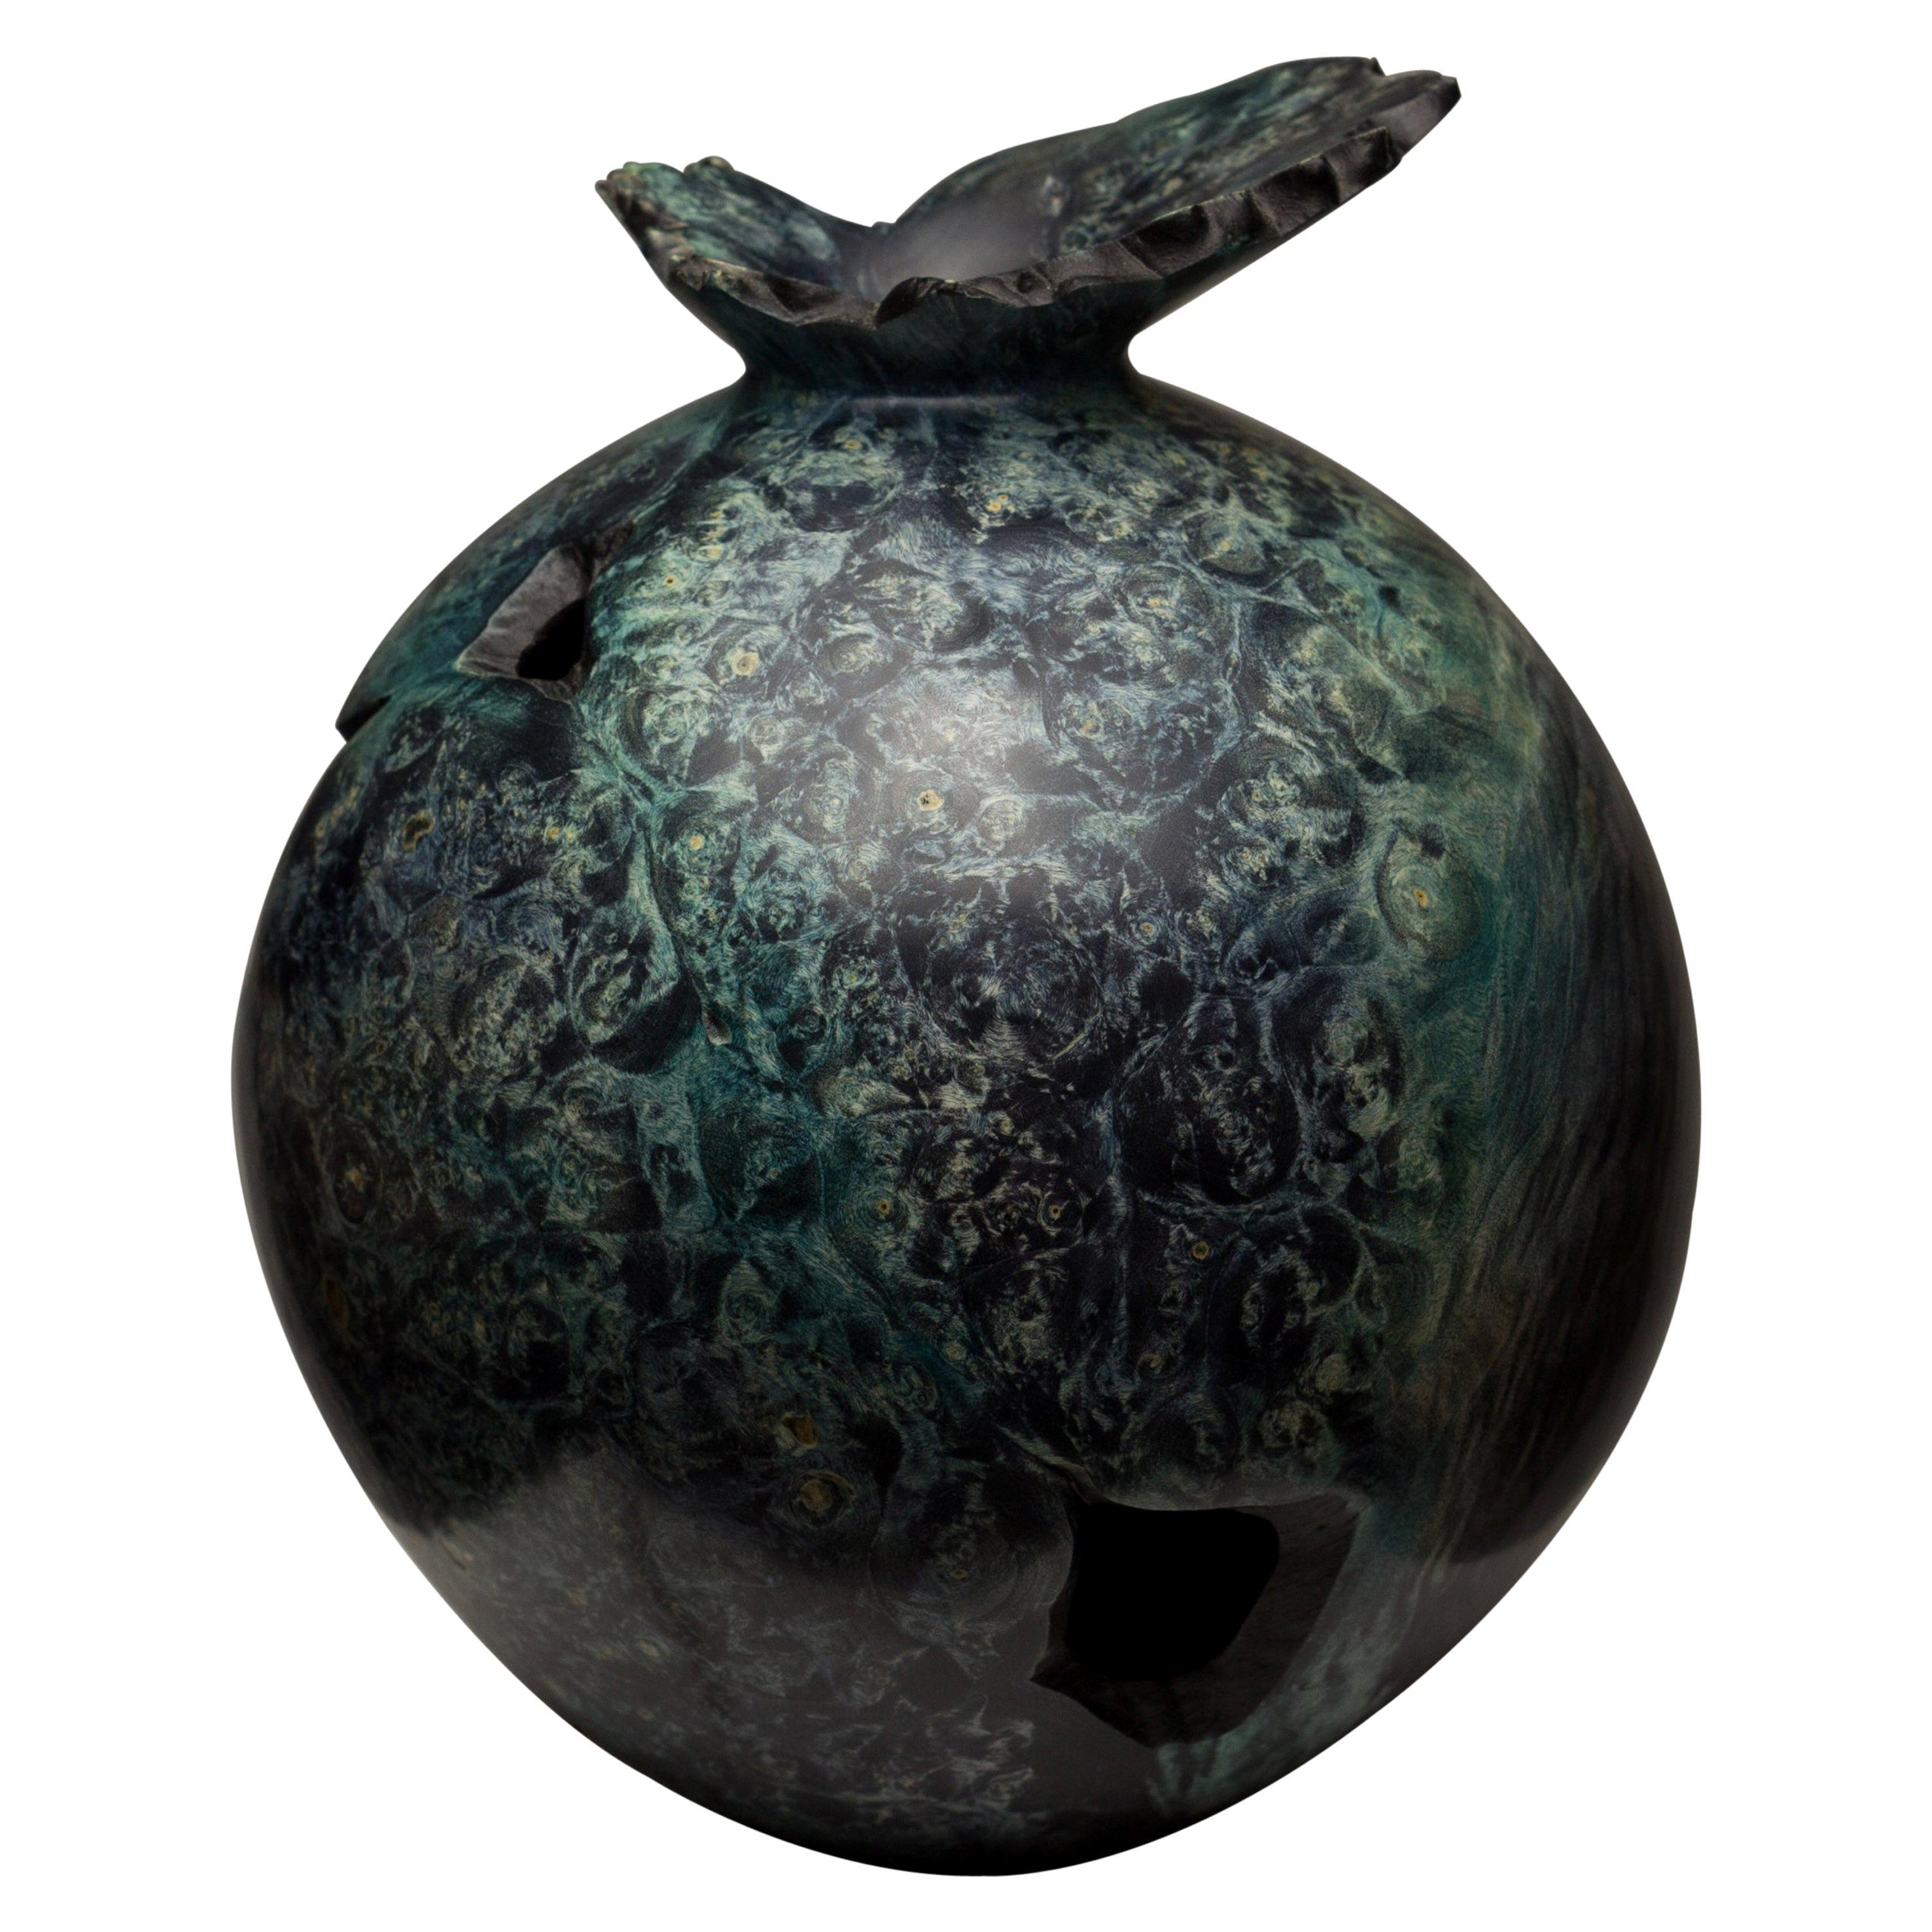 Dyed Boxelder Burl Form by Vlad Droz